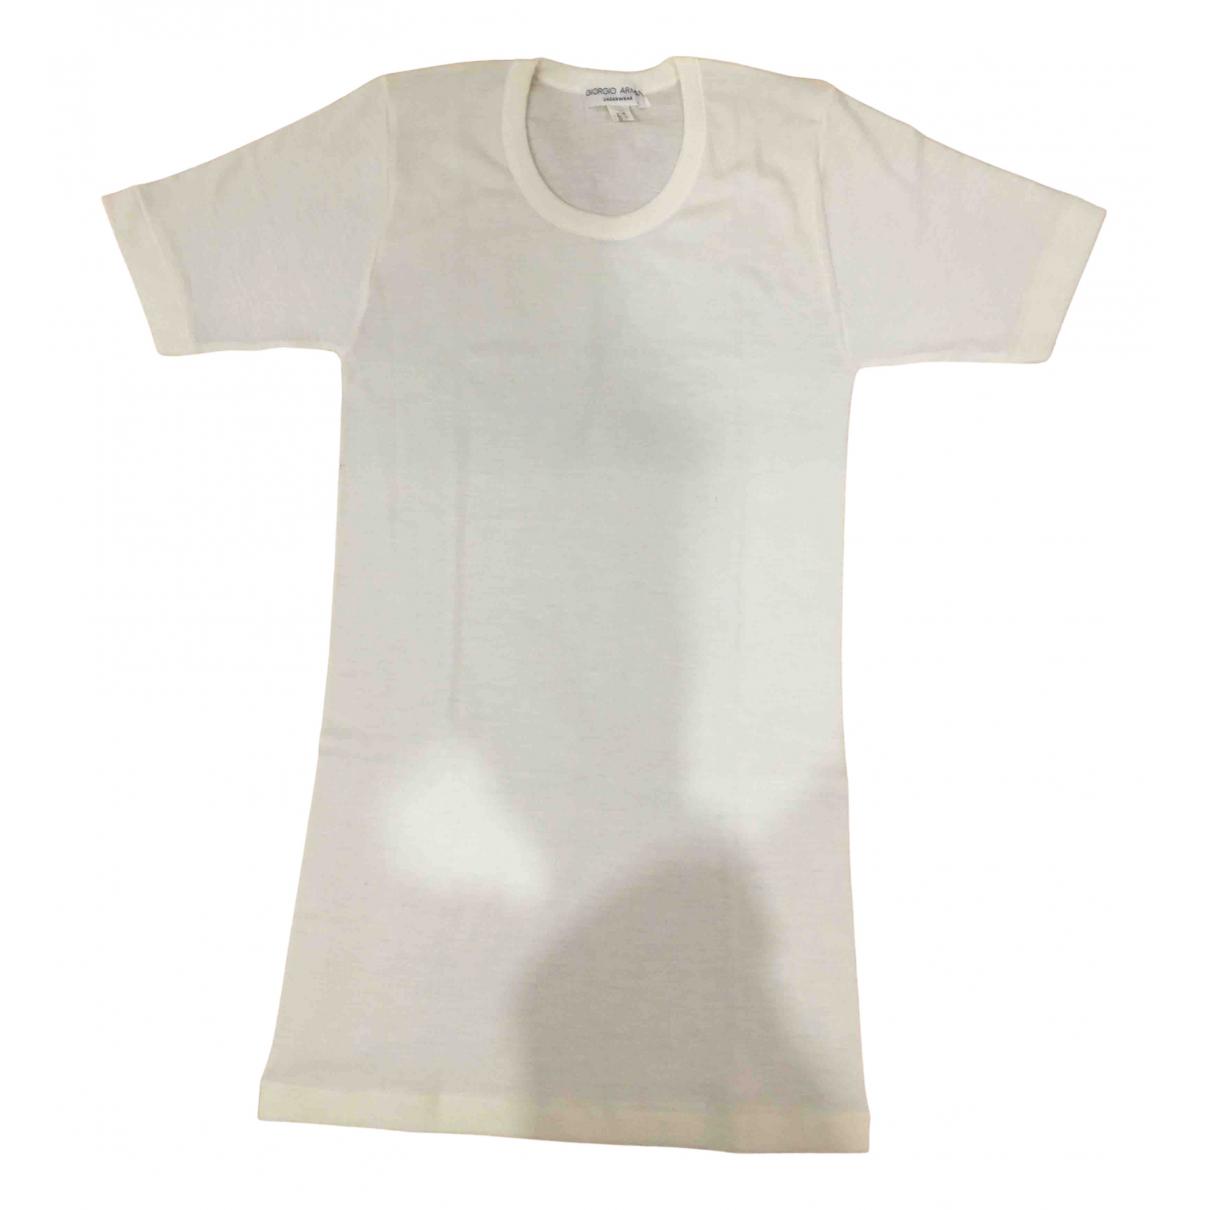 Giorgio Armani - Polos   pour homme en autre - blanc